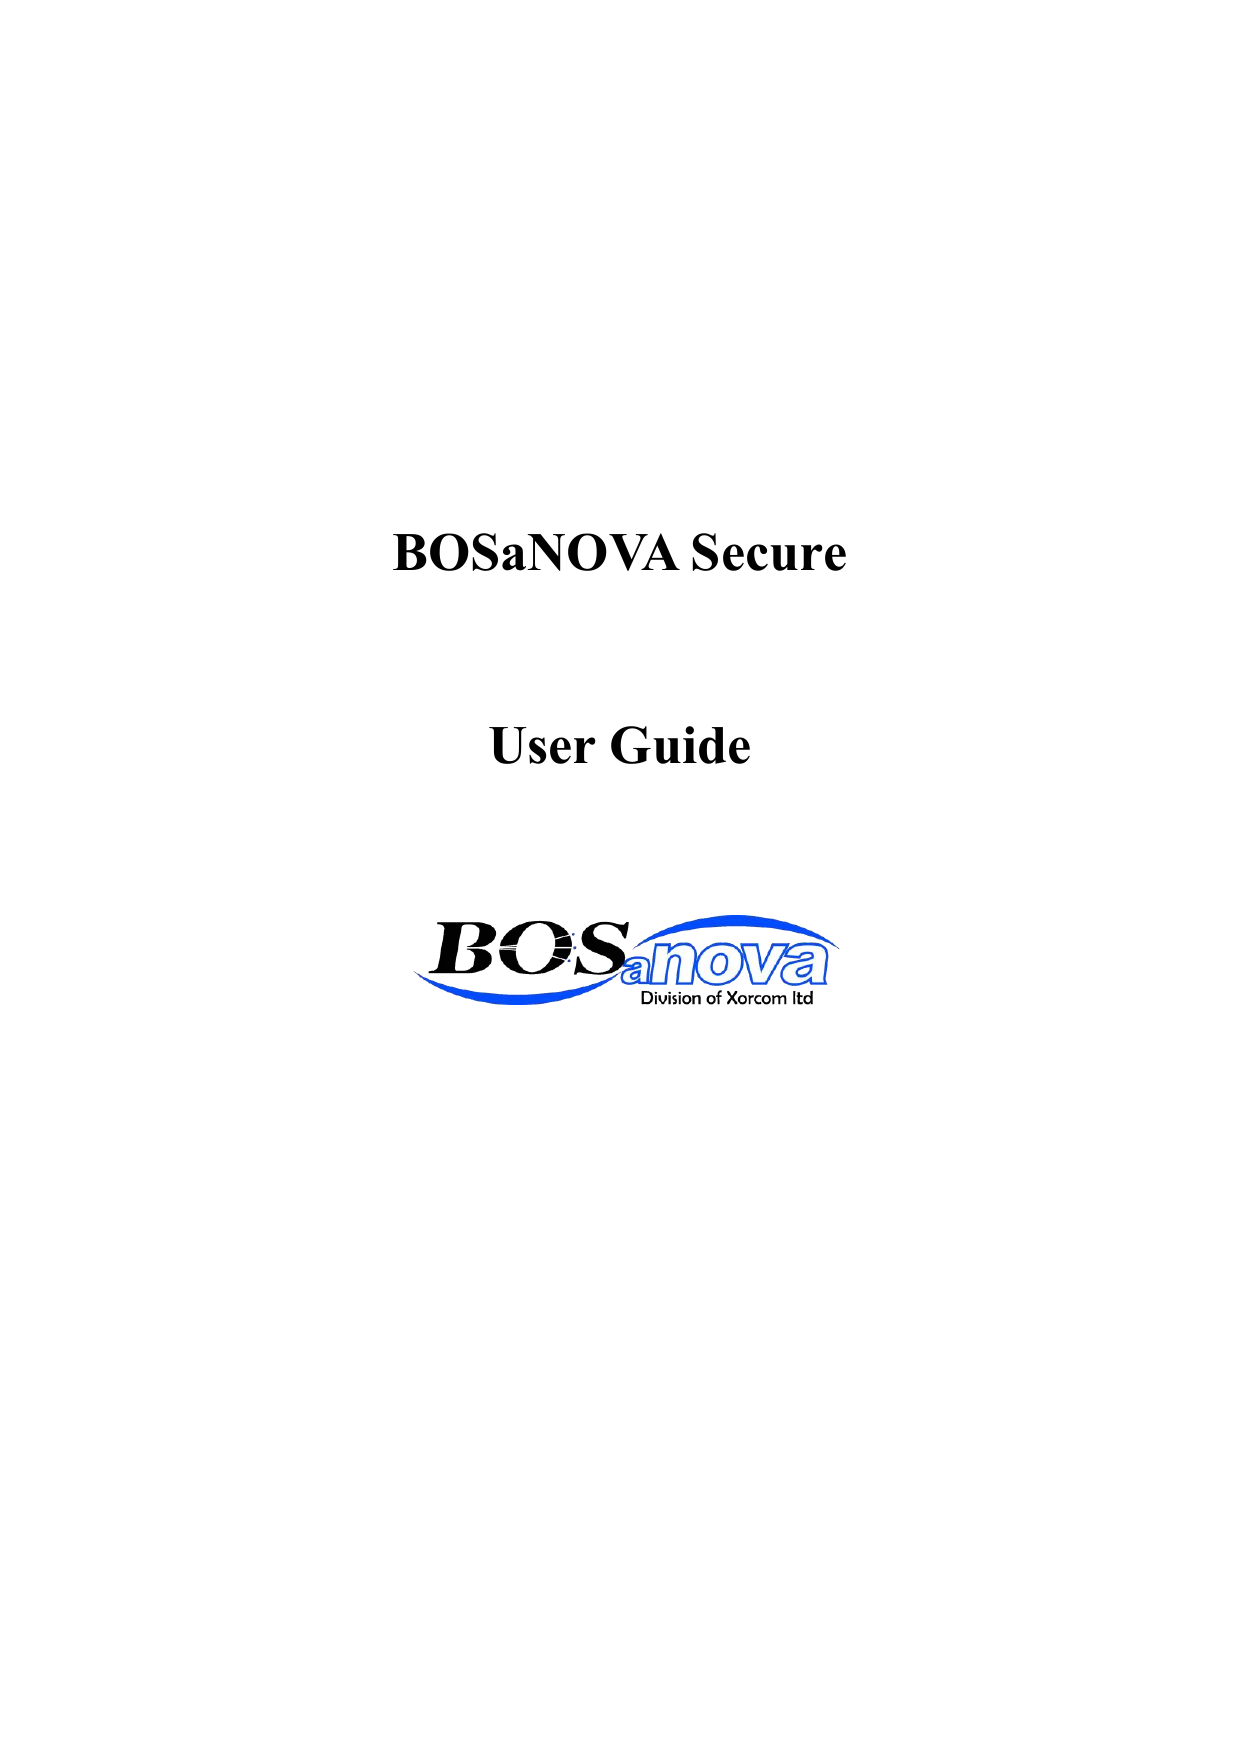 BOSaNOVA Secure User Guide